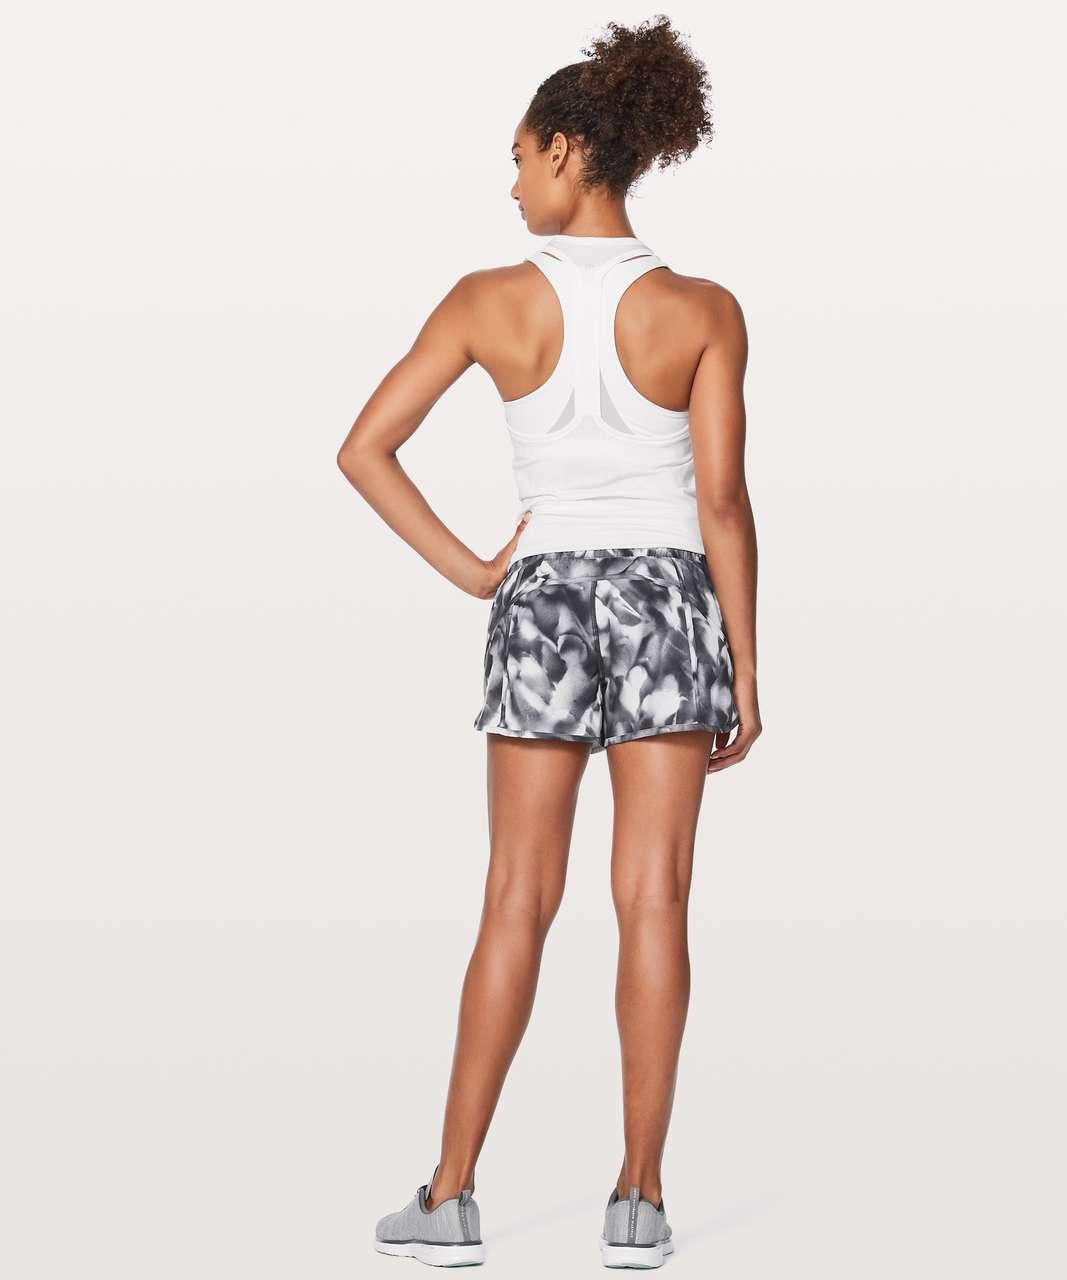 "Lululemon Tracker Short V *4"" - Mini Blush Blossom Alpine White Black / Black"